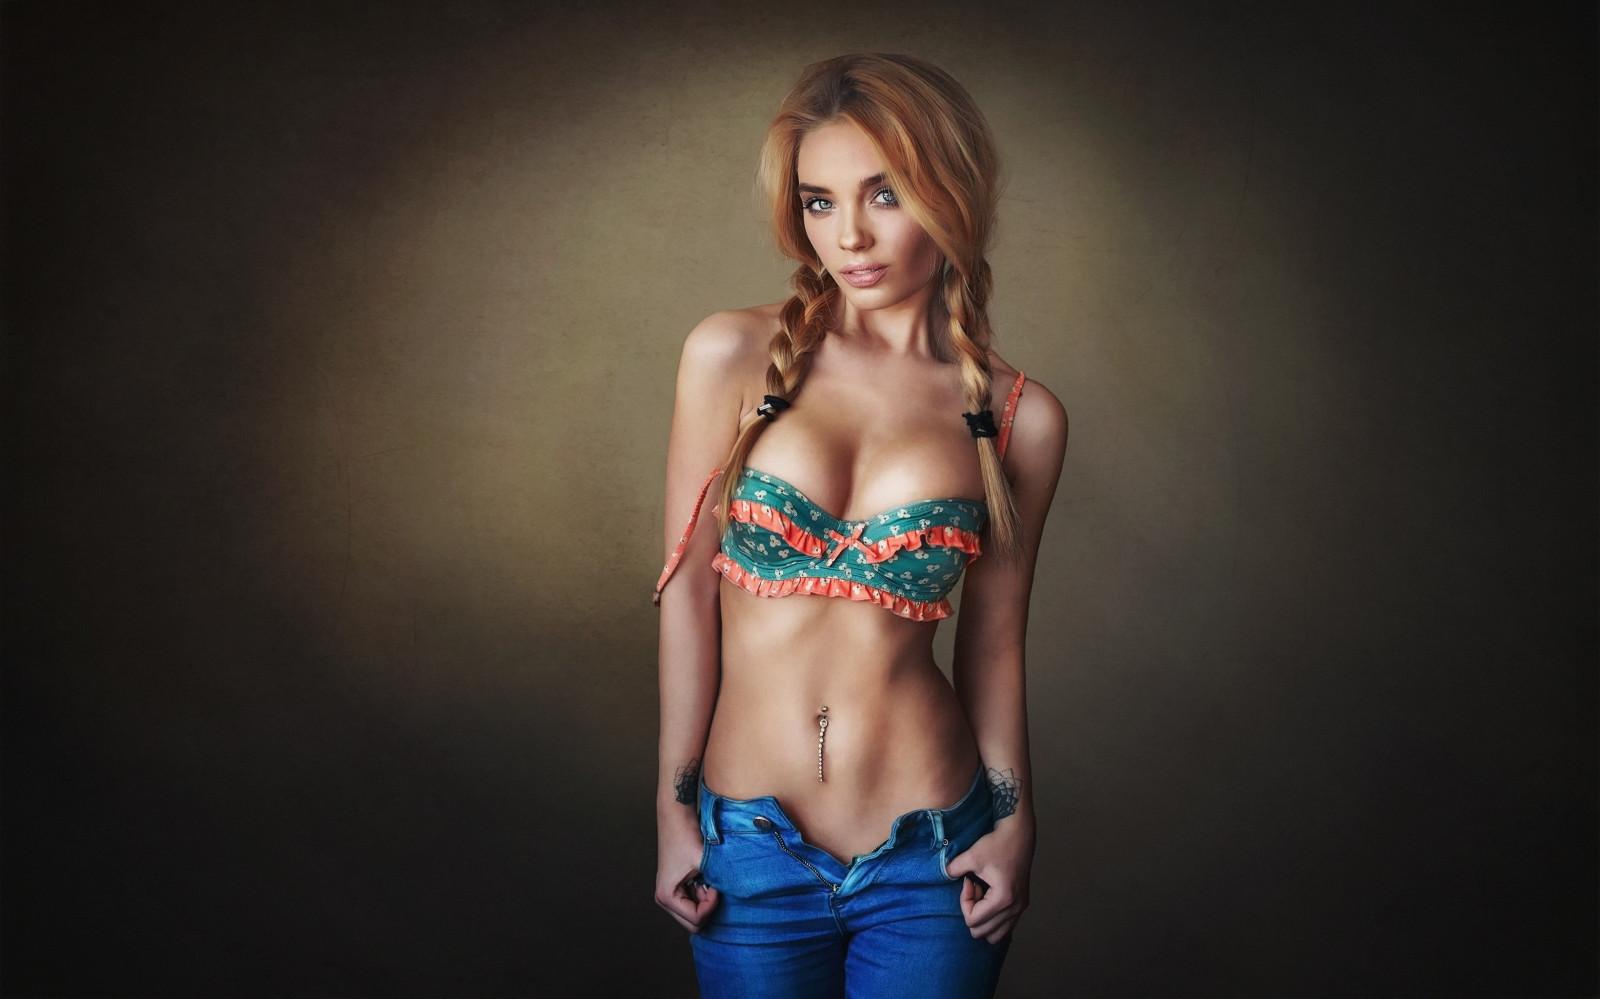 Пизда девушка с голым животом стоя